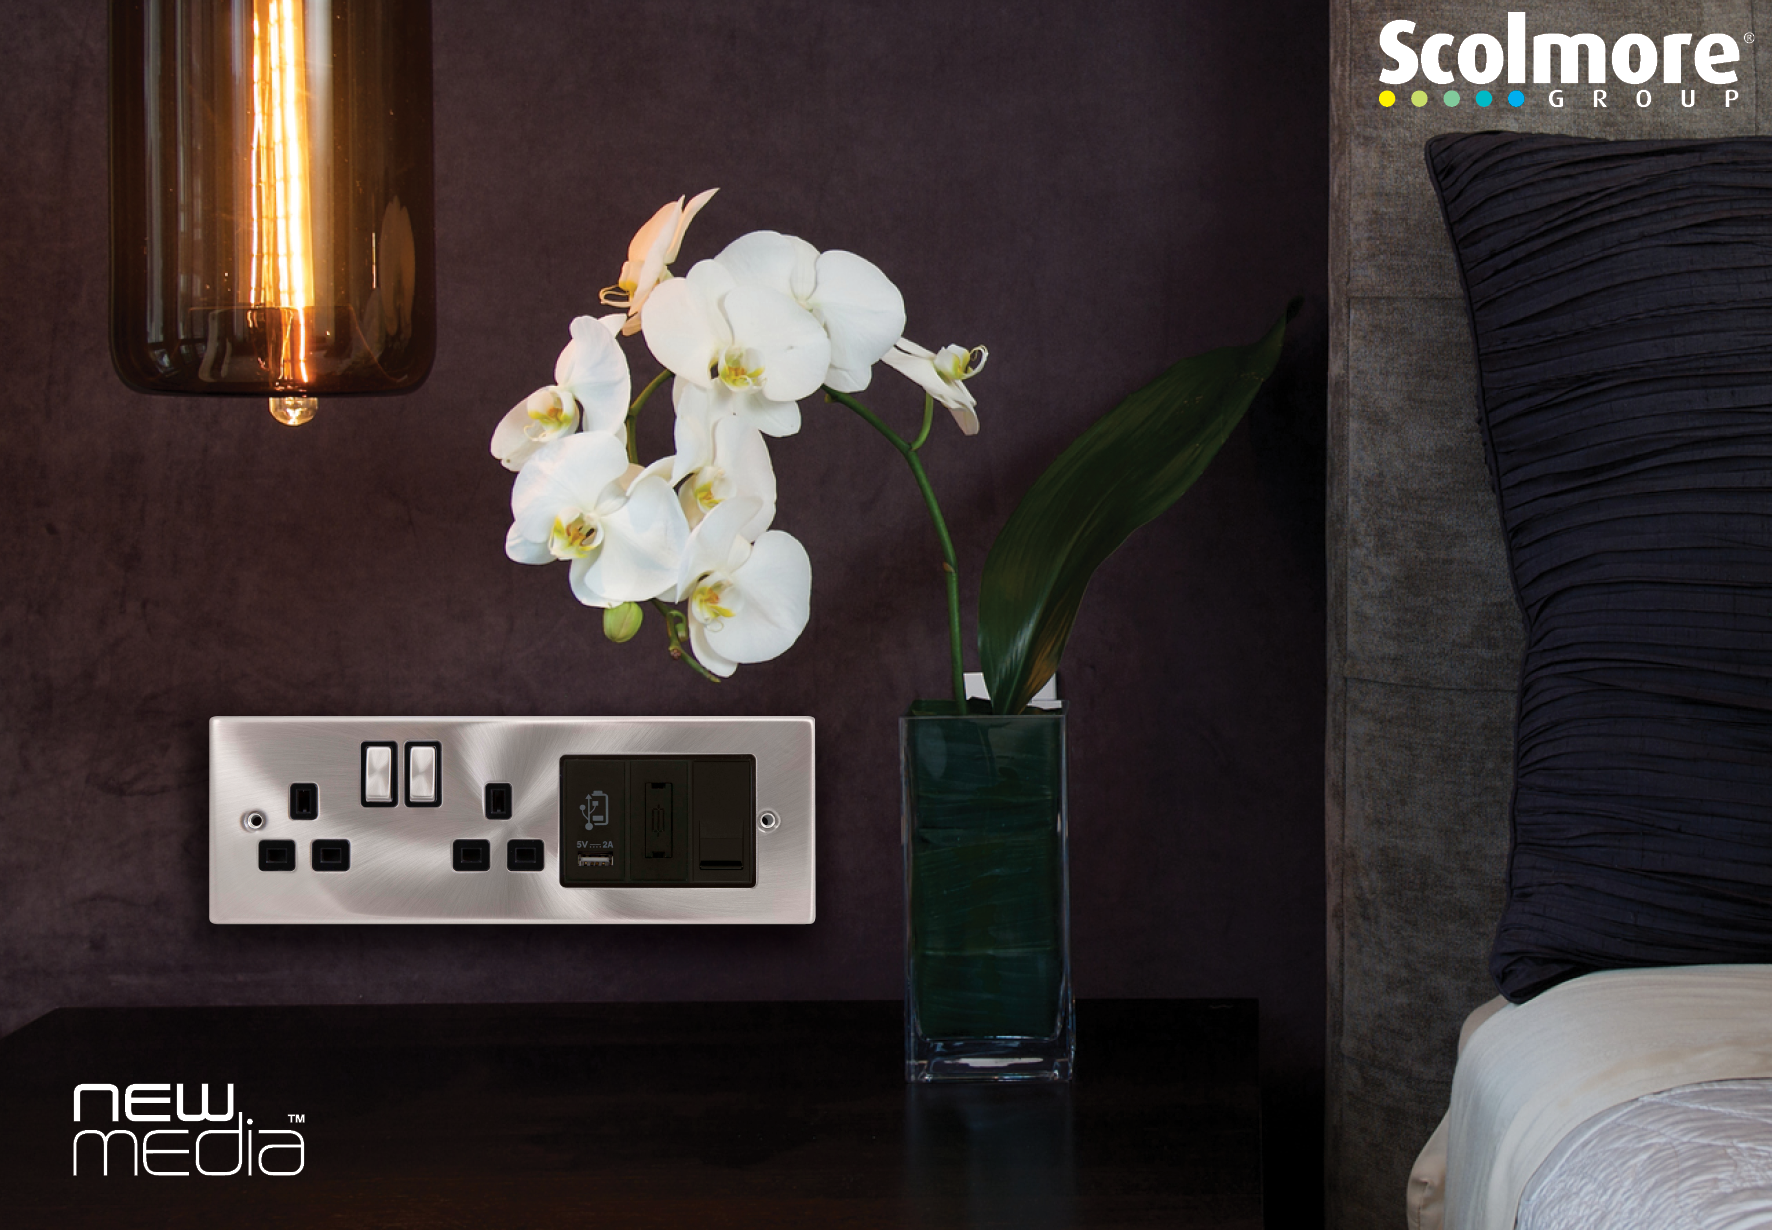 Scolmore Launches Half Media Plates